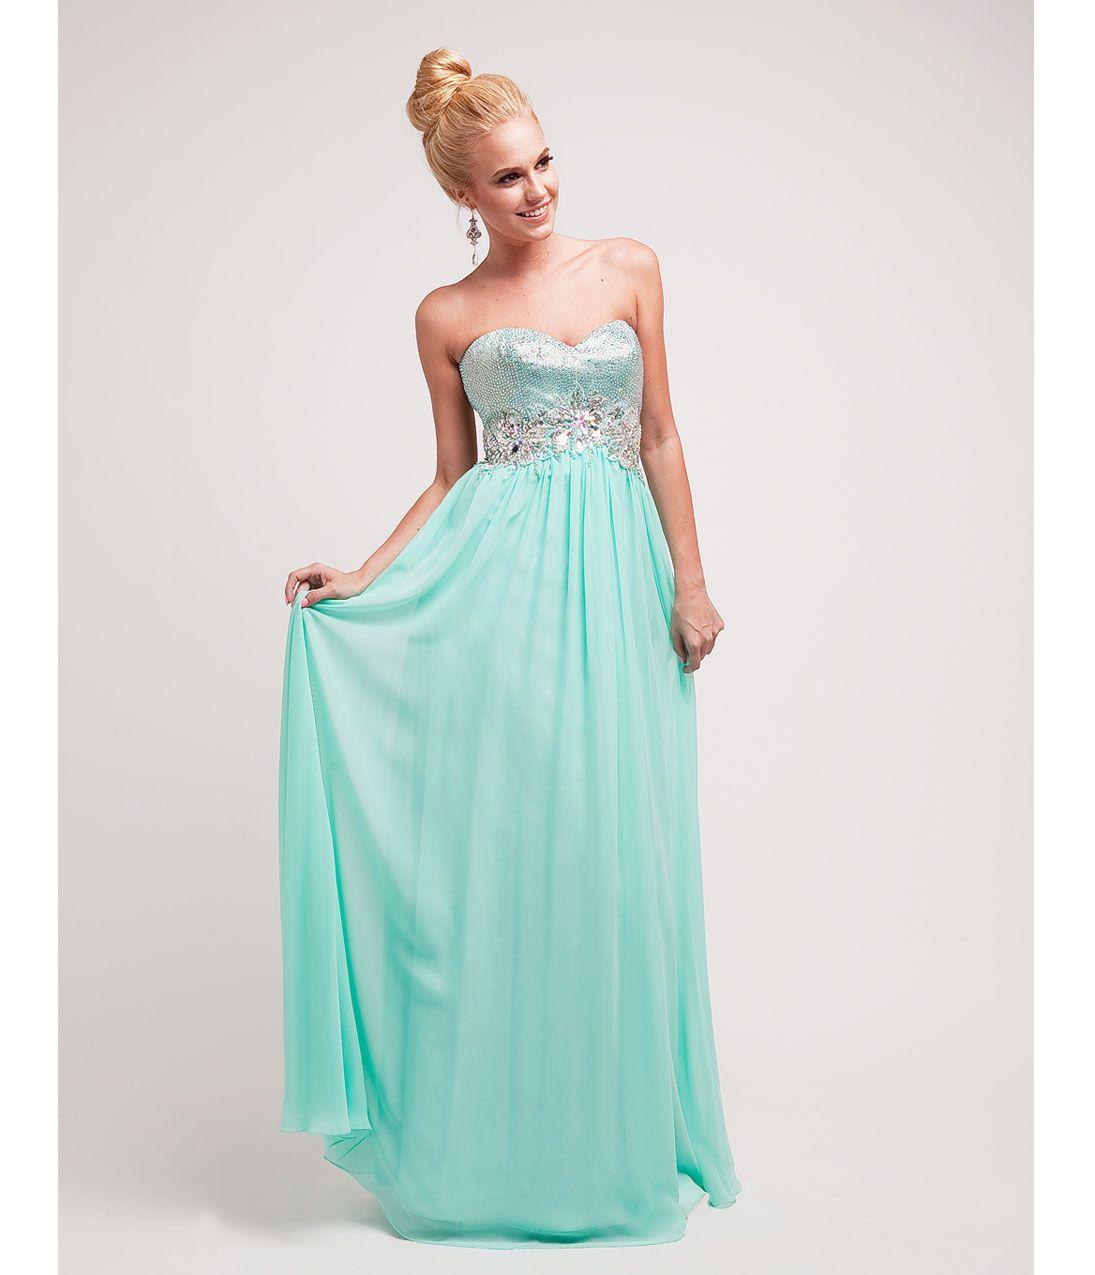 stop staring s style navy u ivory railene dress prom